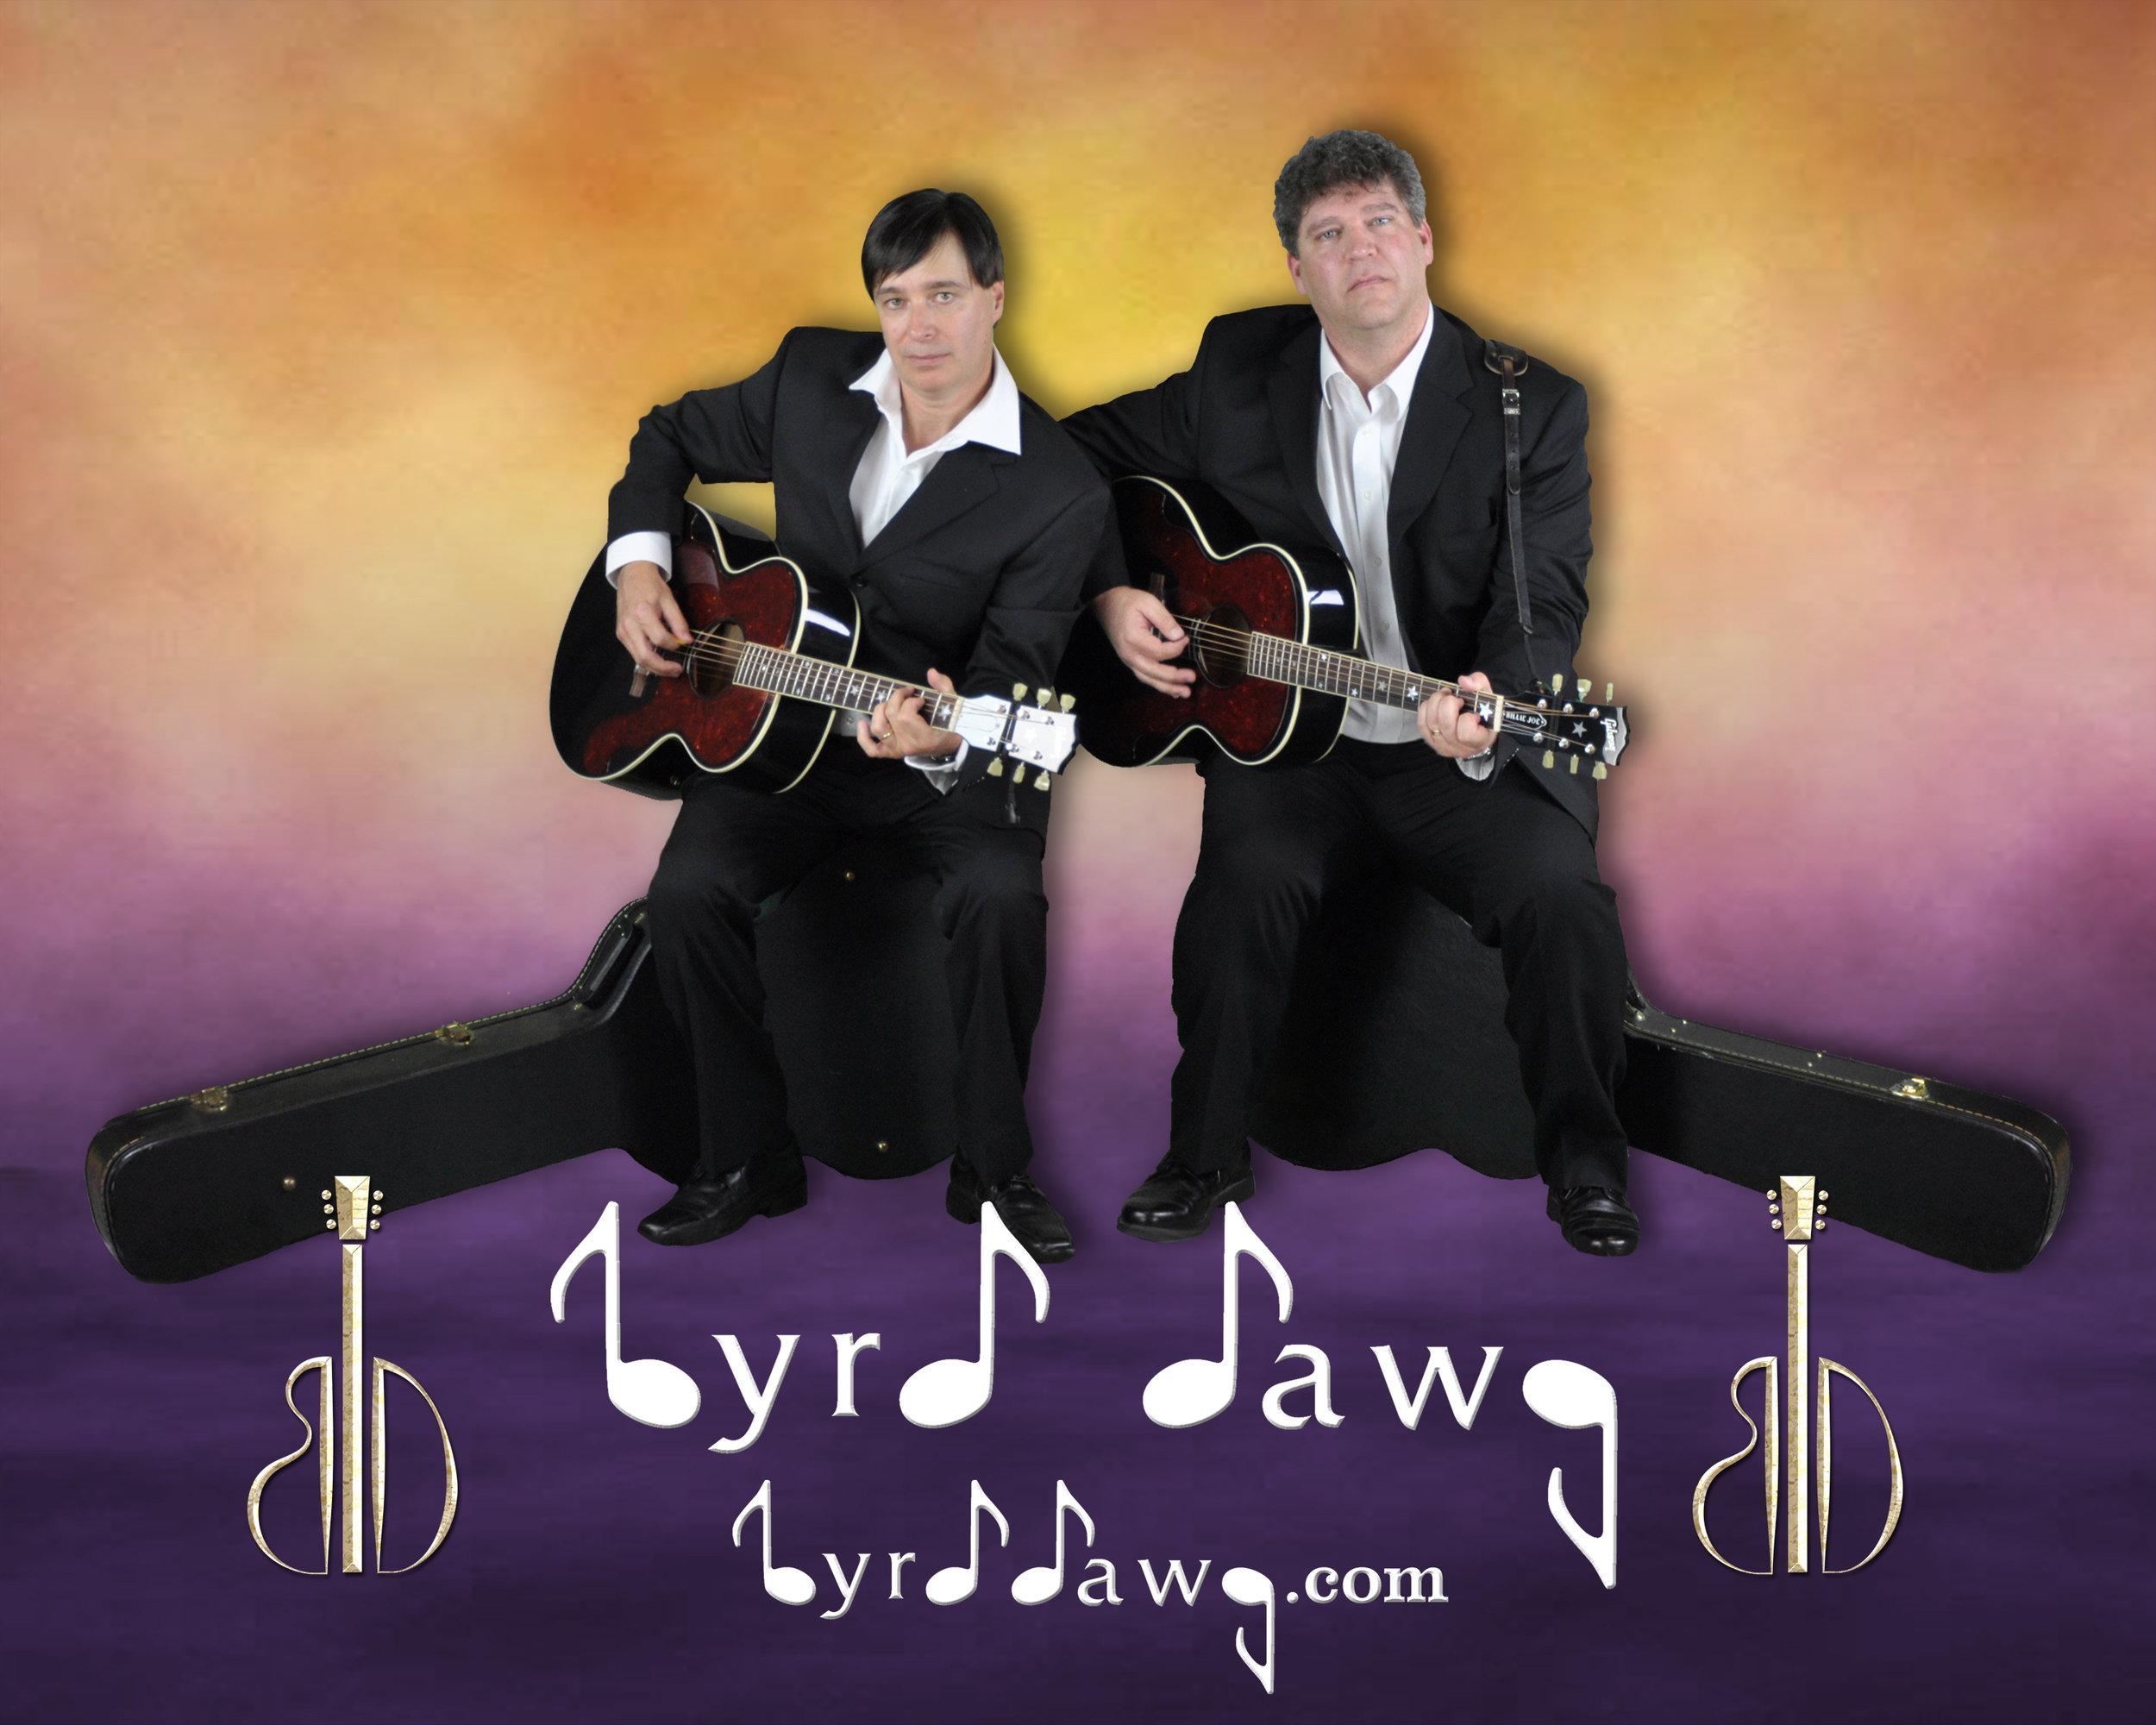 6:00 - 6:45Byrd Dawg - Everly Brothers/ Simon and Garfunkel Tribute -